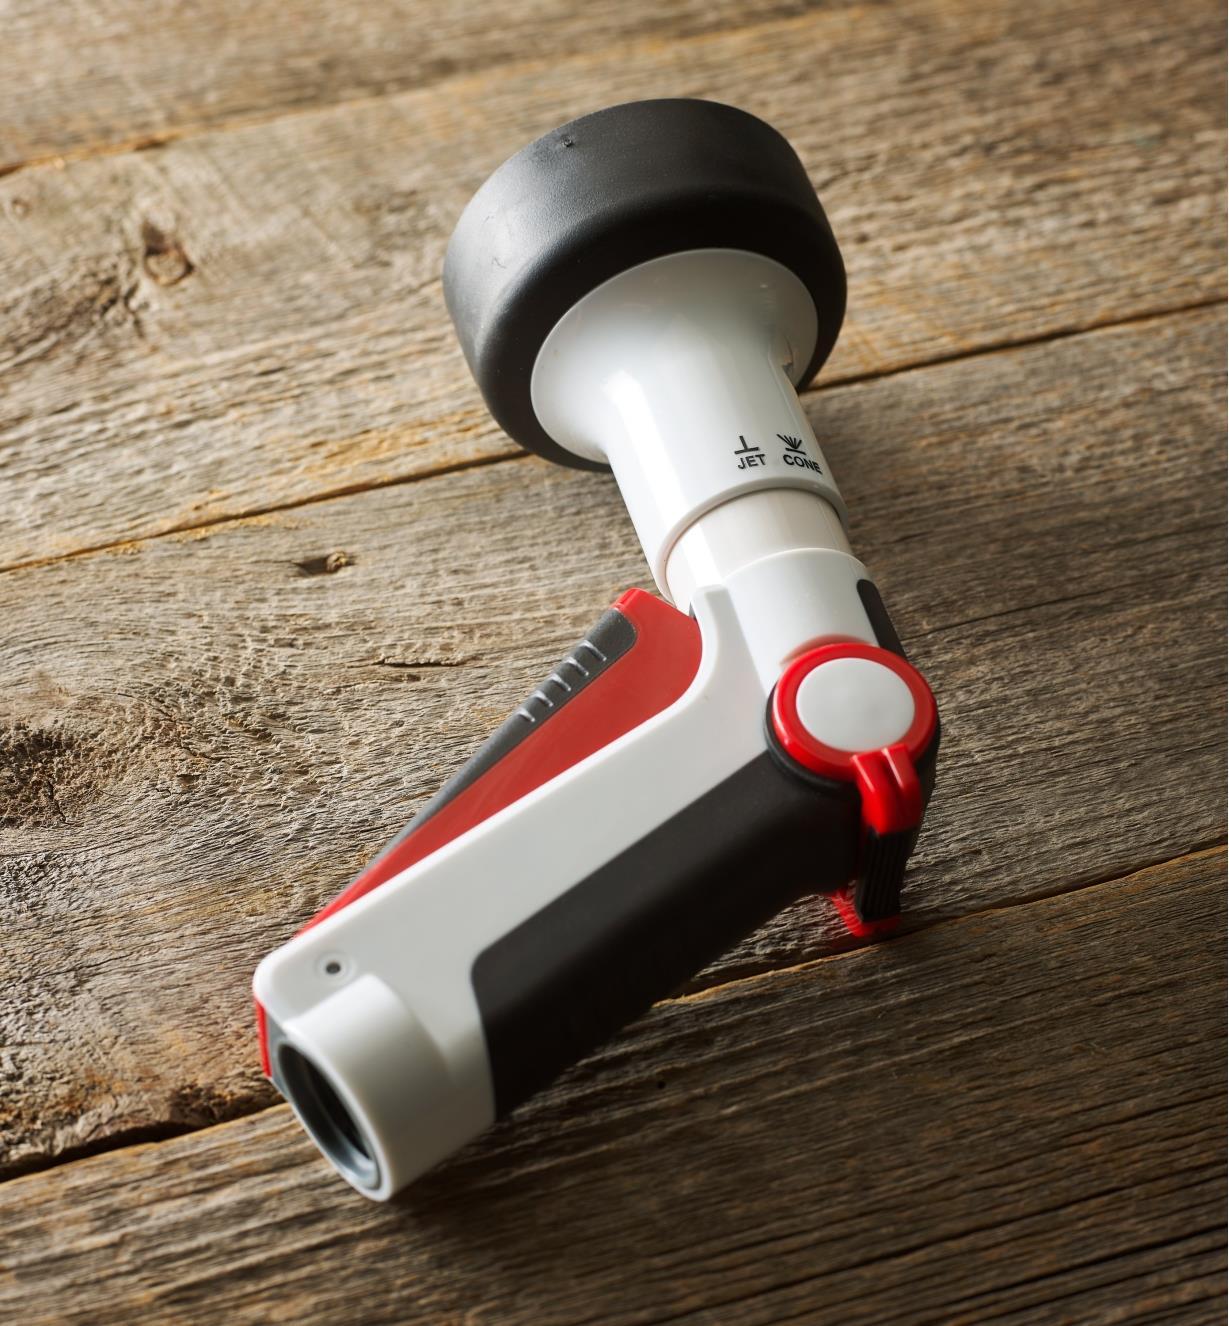 AL845 - Large Shower Spray Nozzle